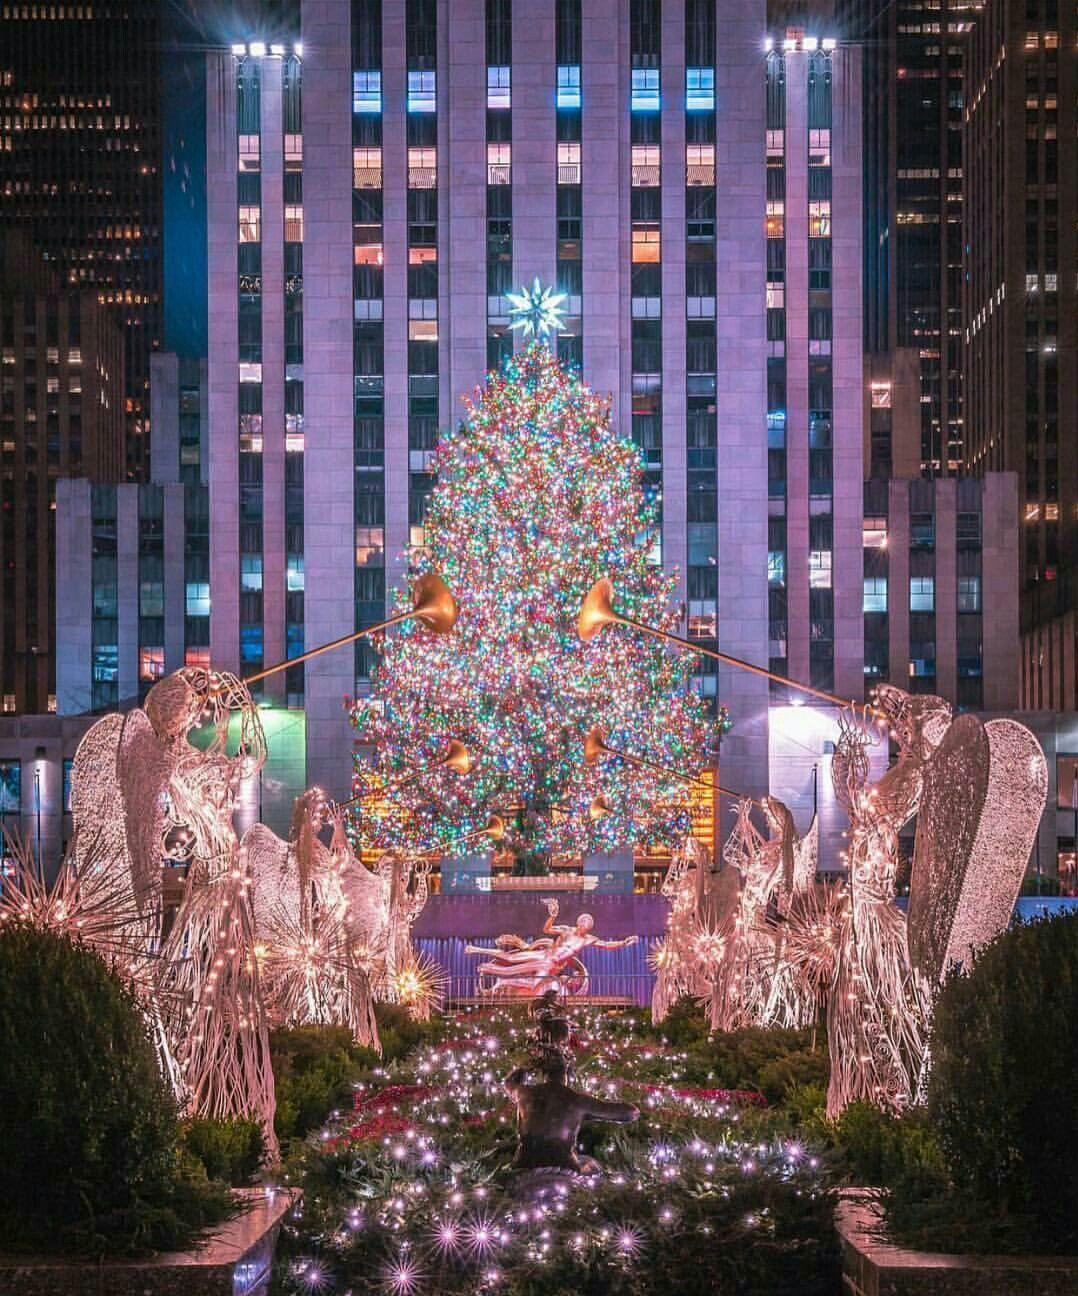 Rockefeller Center Christmas Tree, New York City, USA